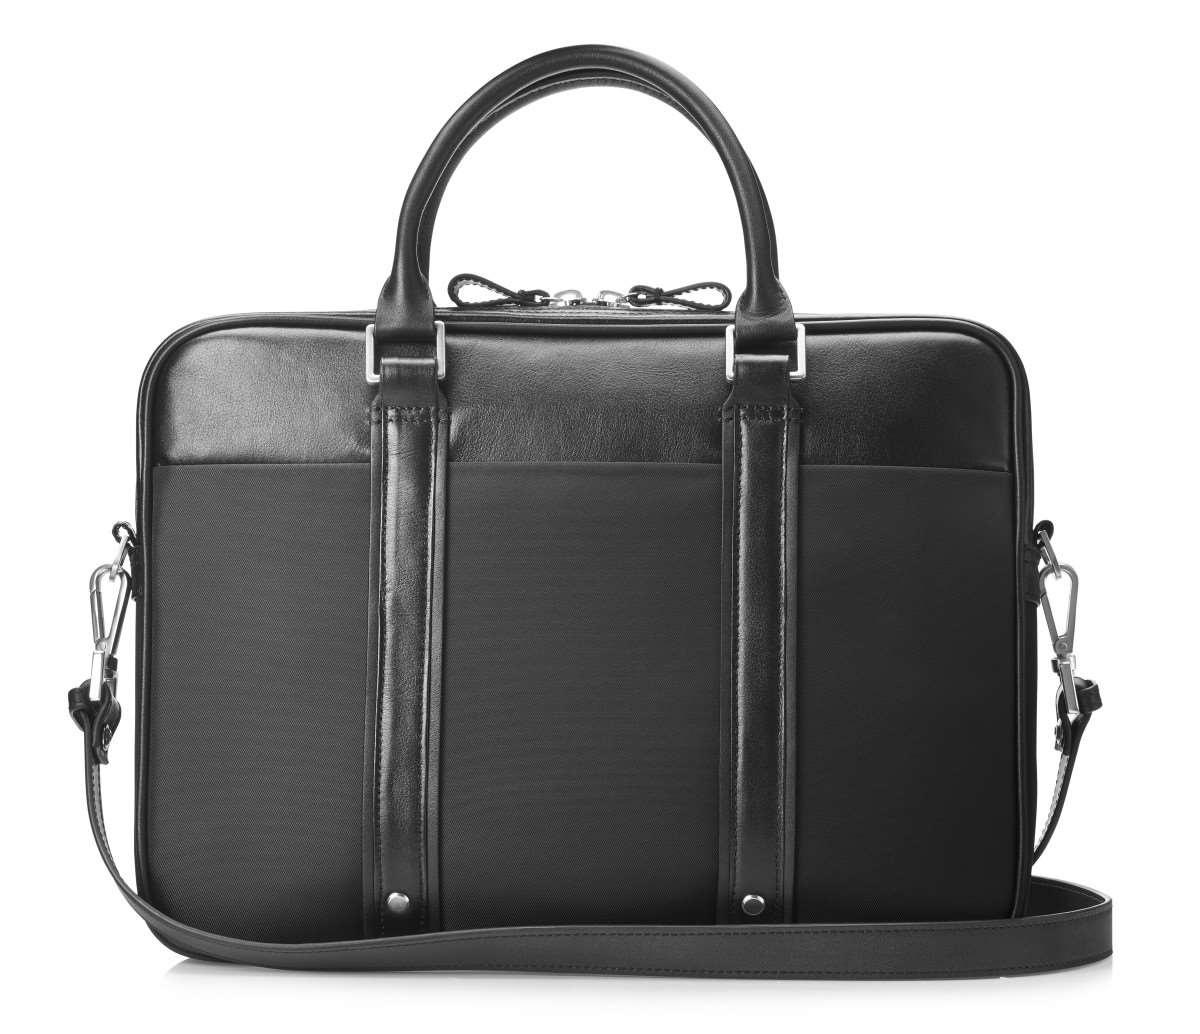 HP 14 Spectre Top Load - Black/Silver - BAG